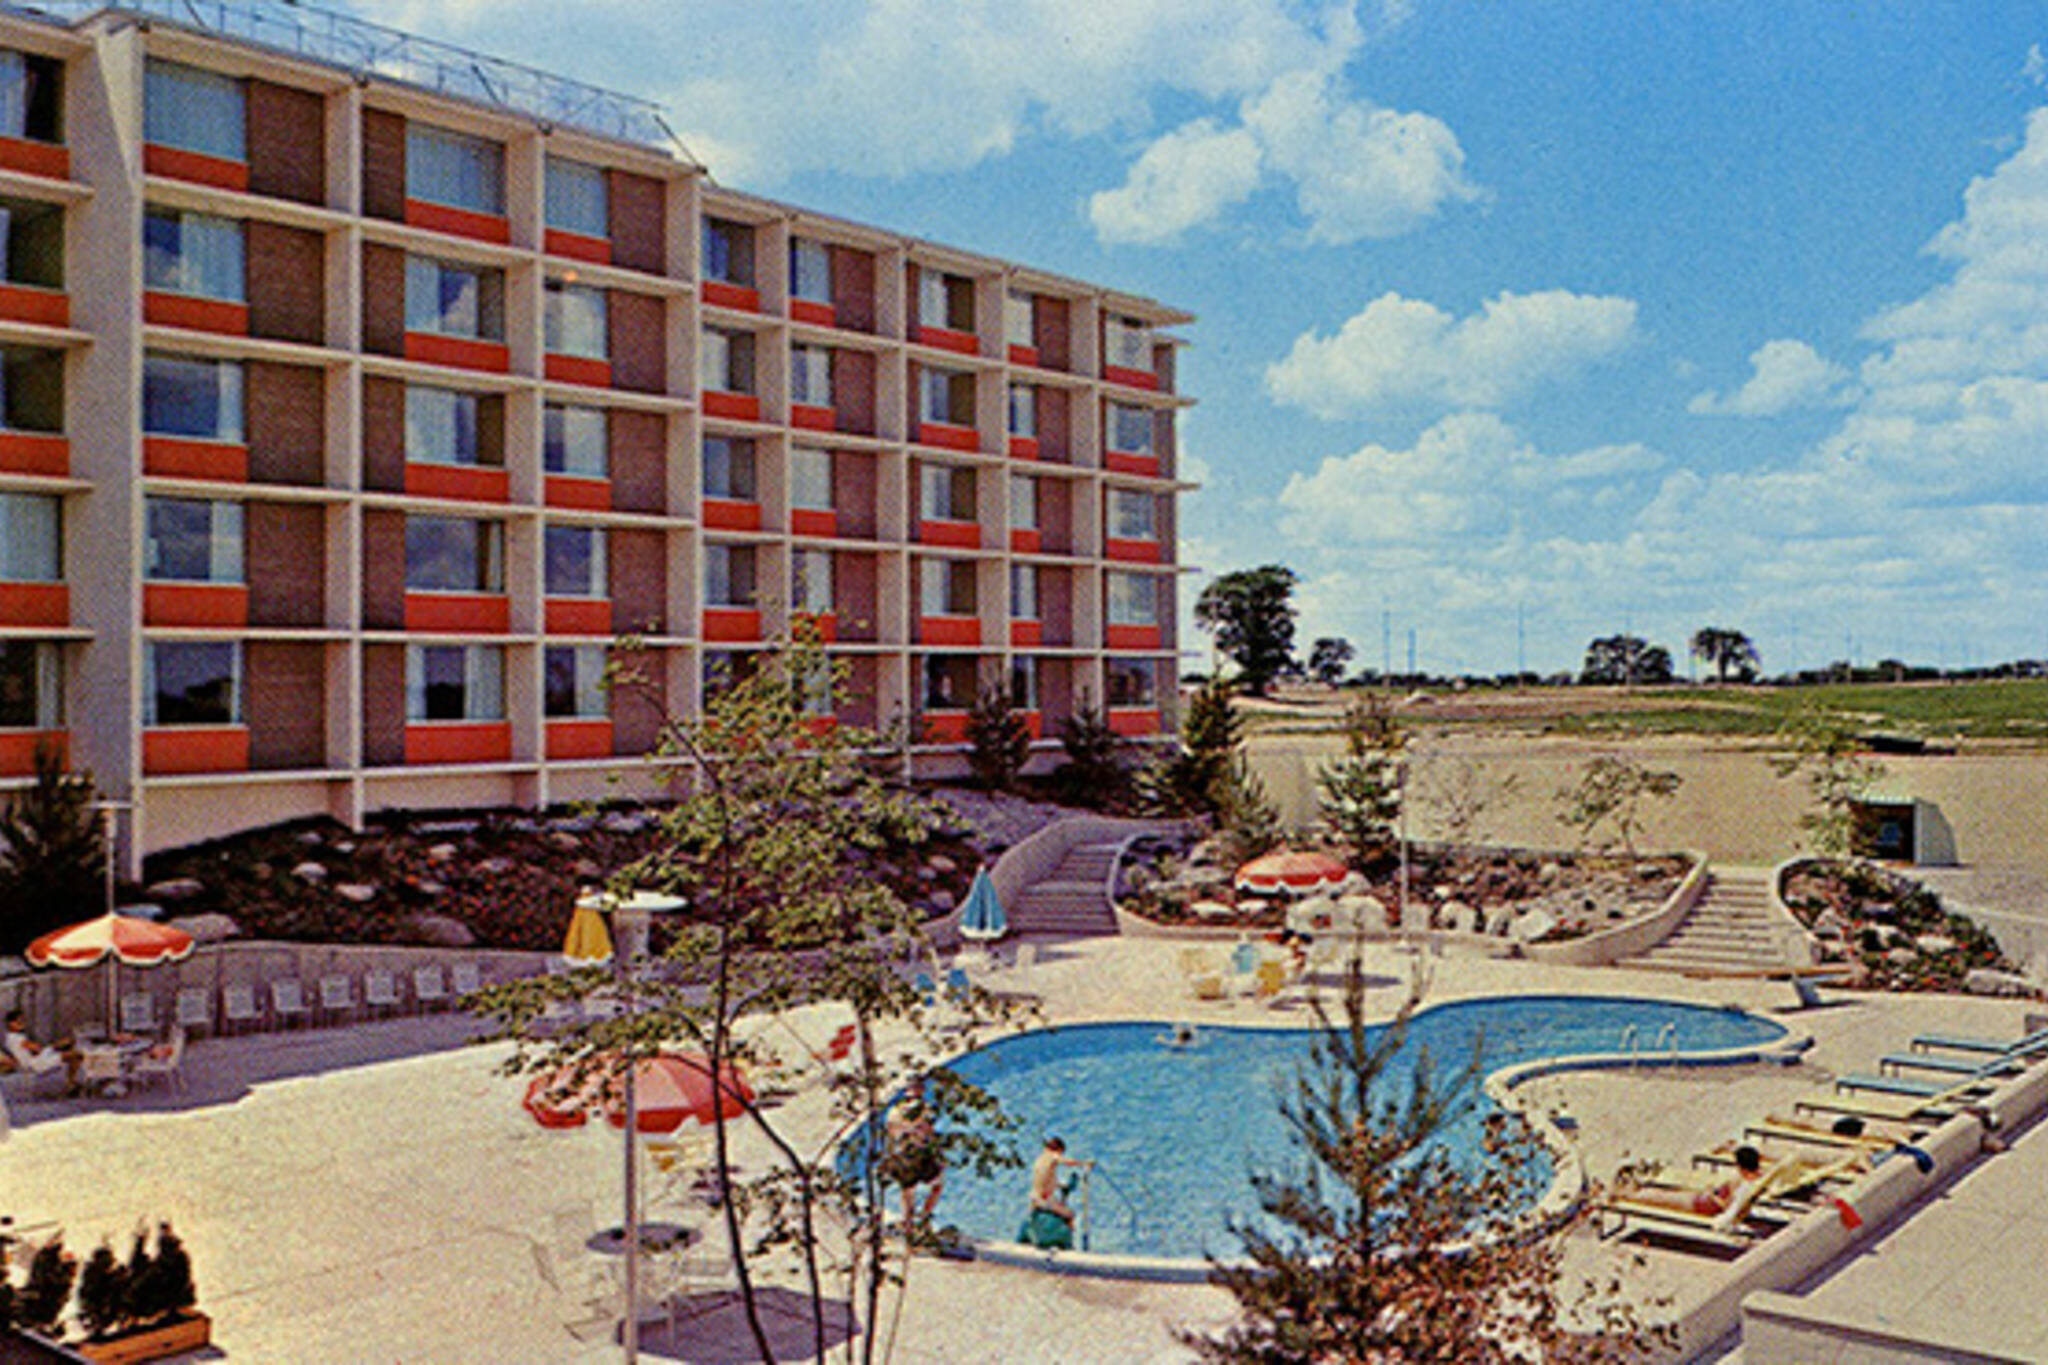 toronto airport hotel strip history